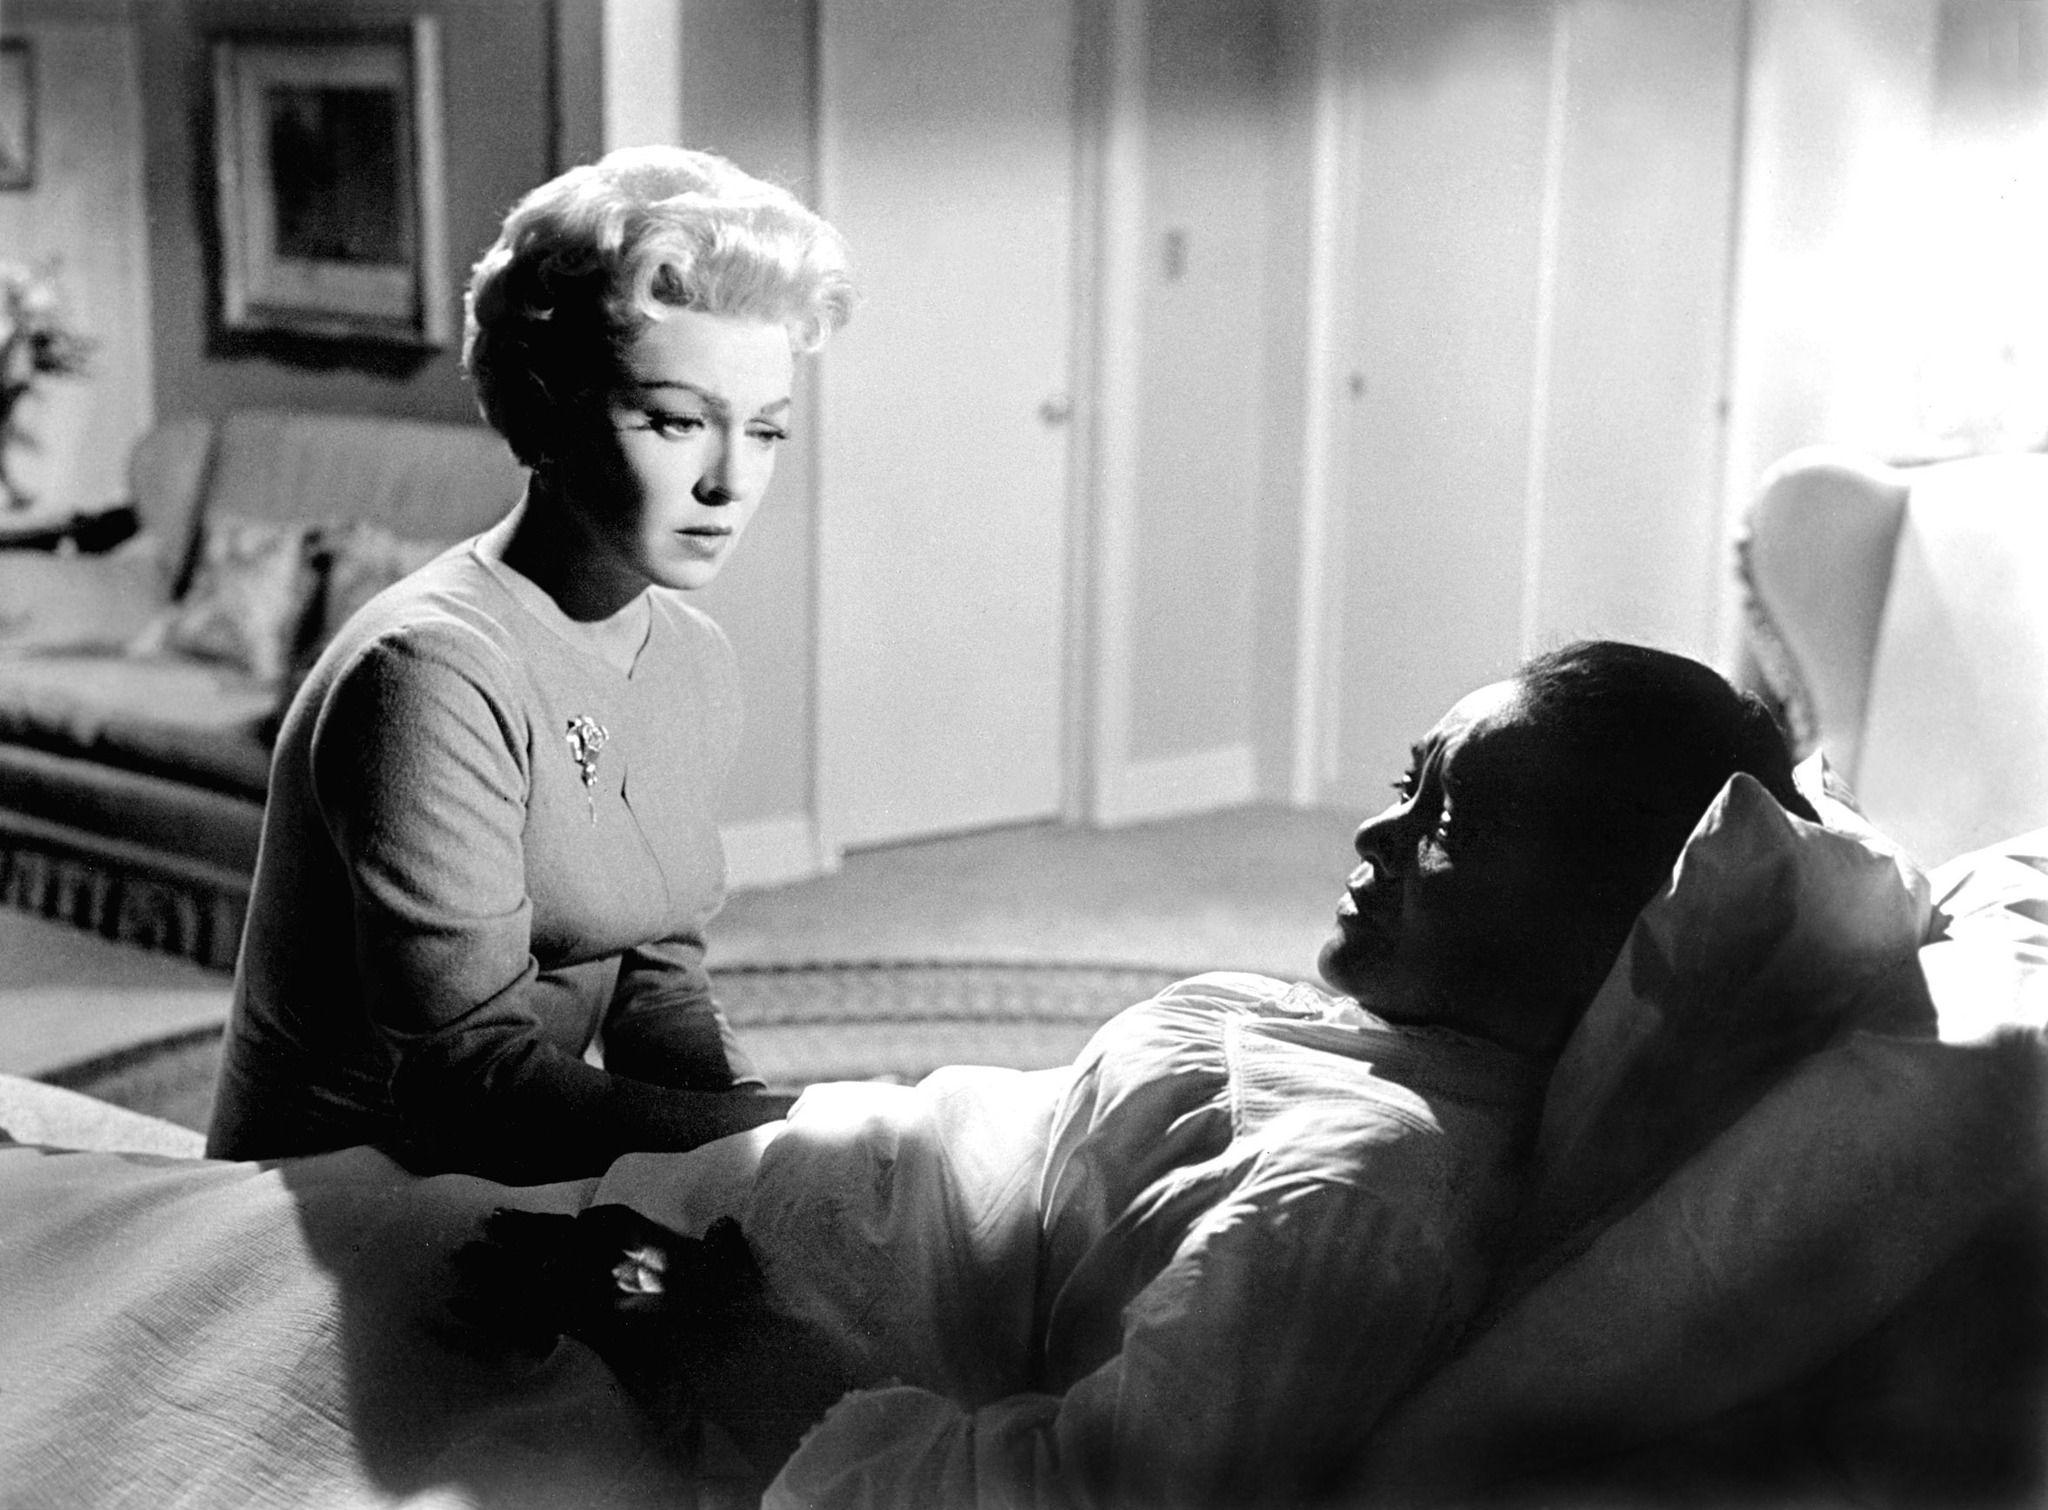 Lana Turner and Juanita Moore in Imitation of Life (1959)